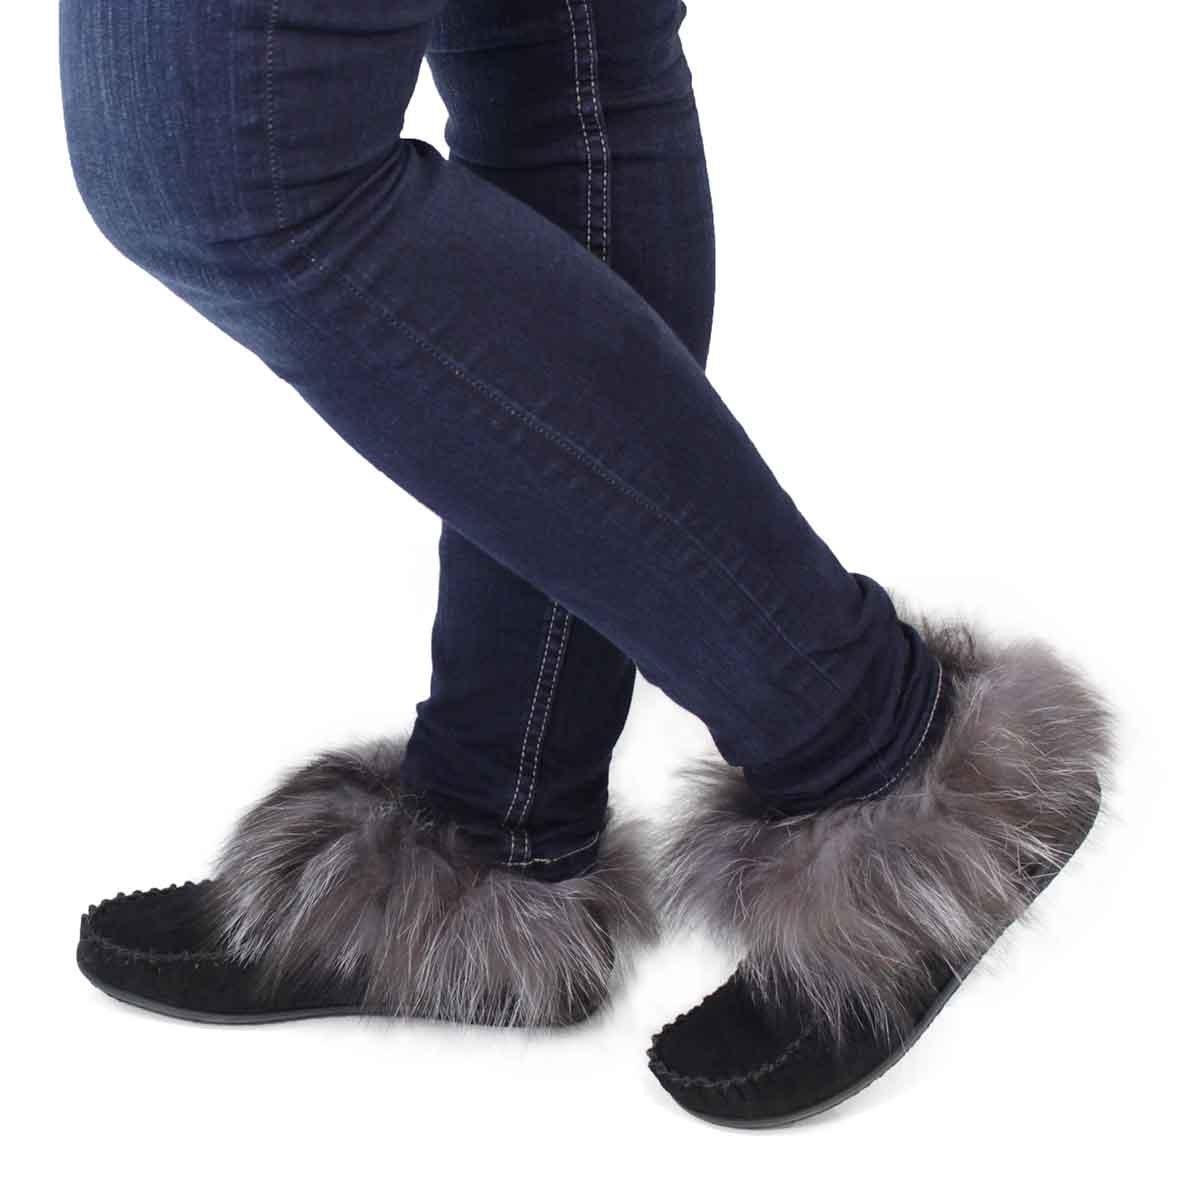 Lds Frances black fox fur moccassin